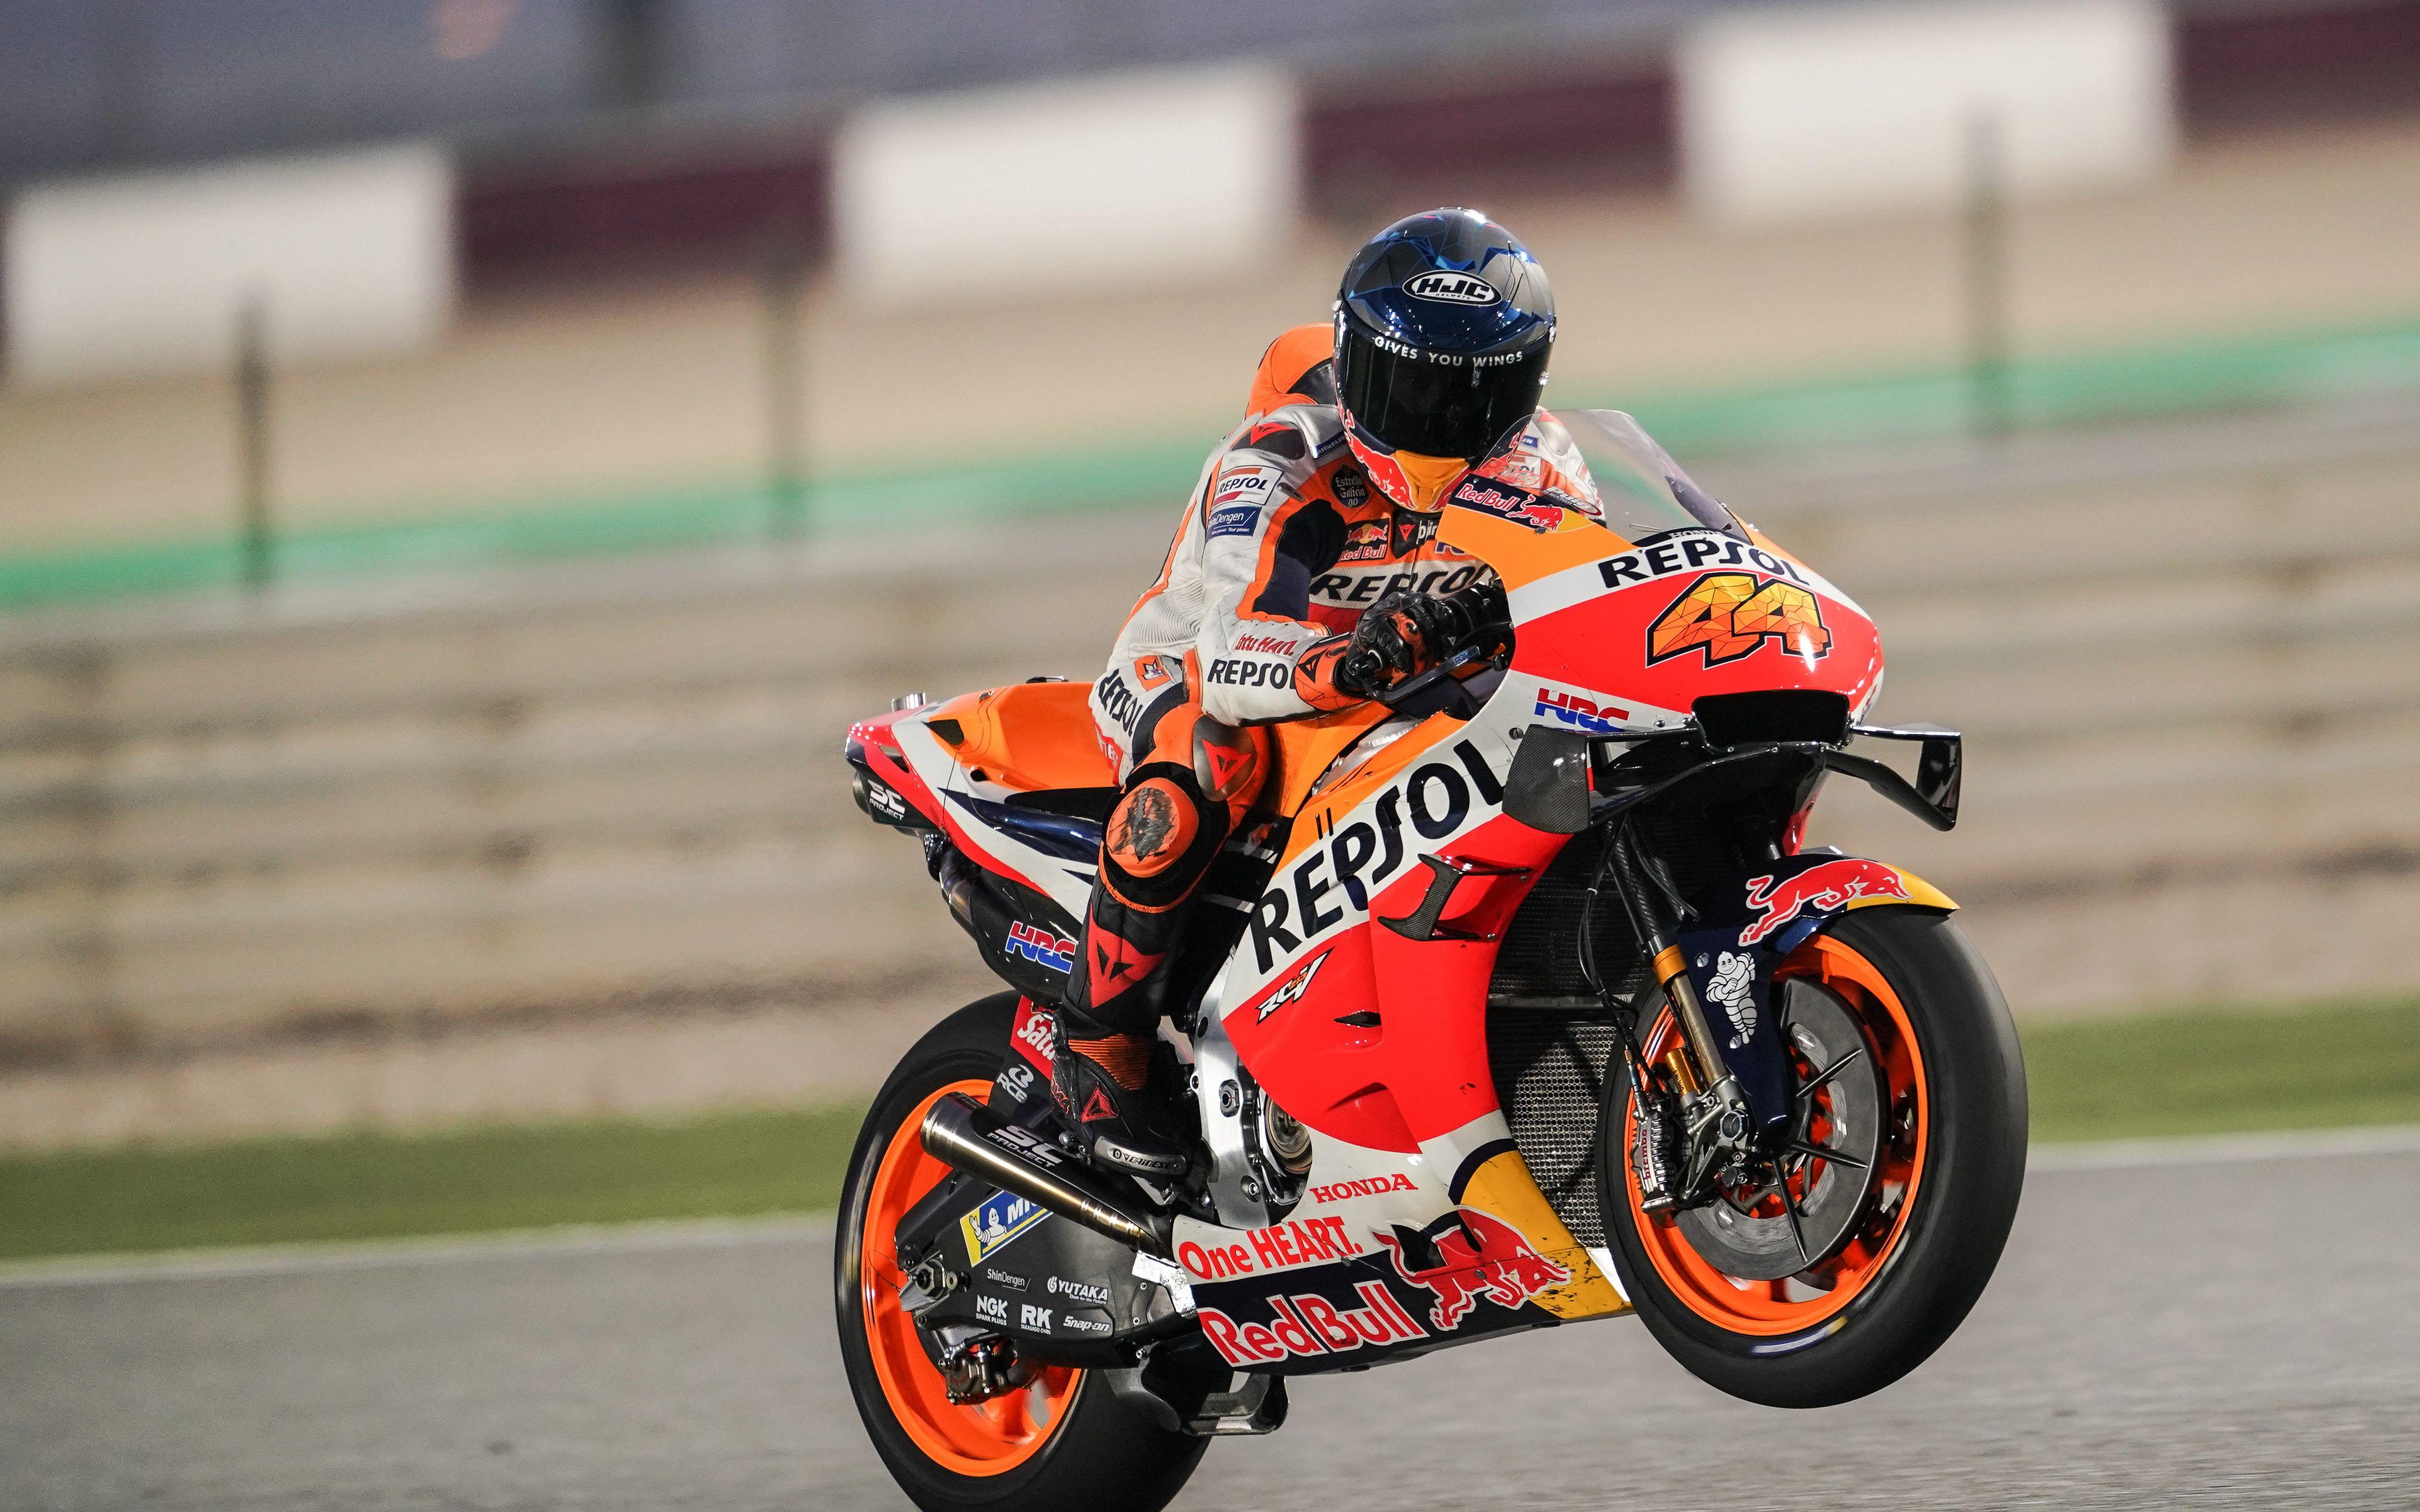 3840x2400 Wallpaper honda, motorcycle, motorcyclist, helmet, speed, track, orange